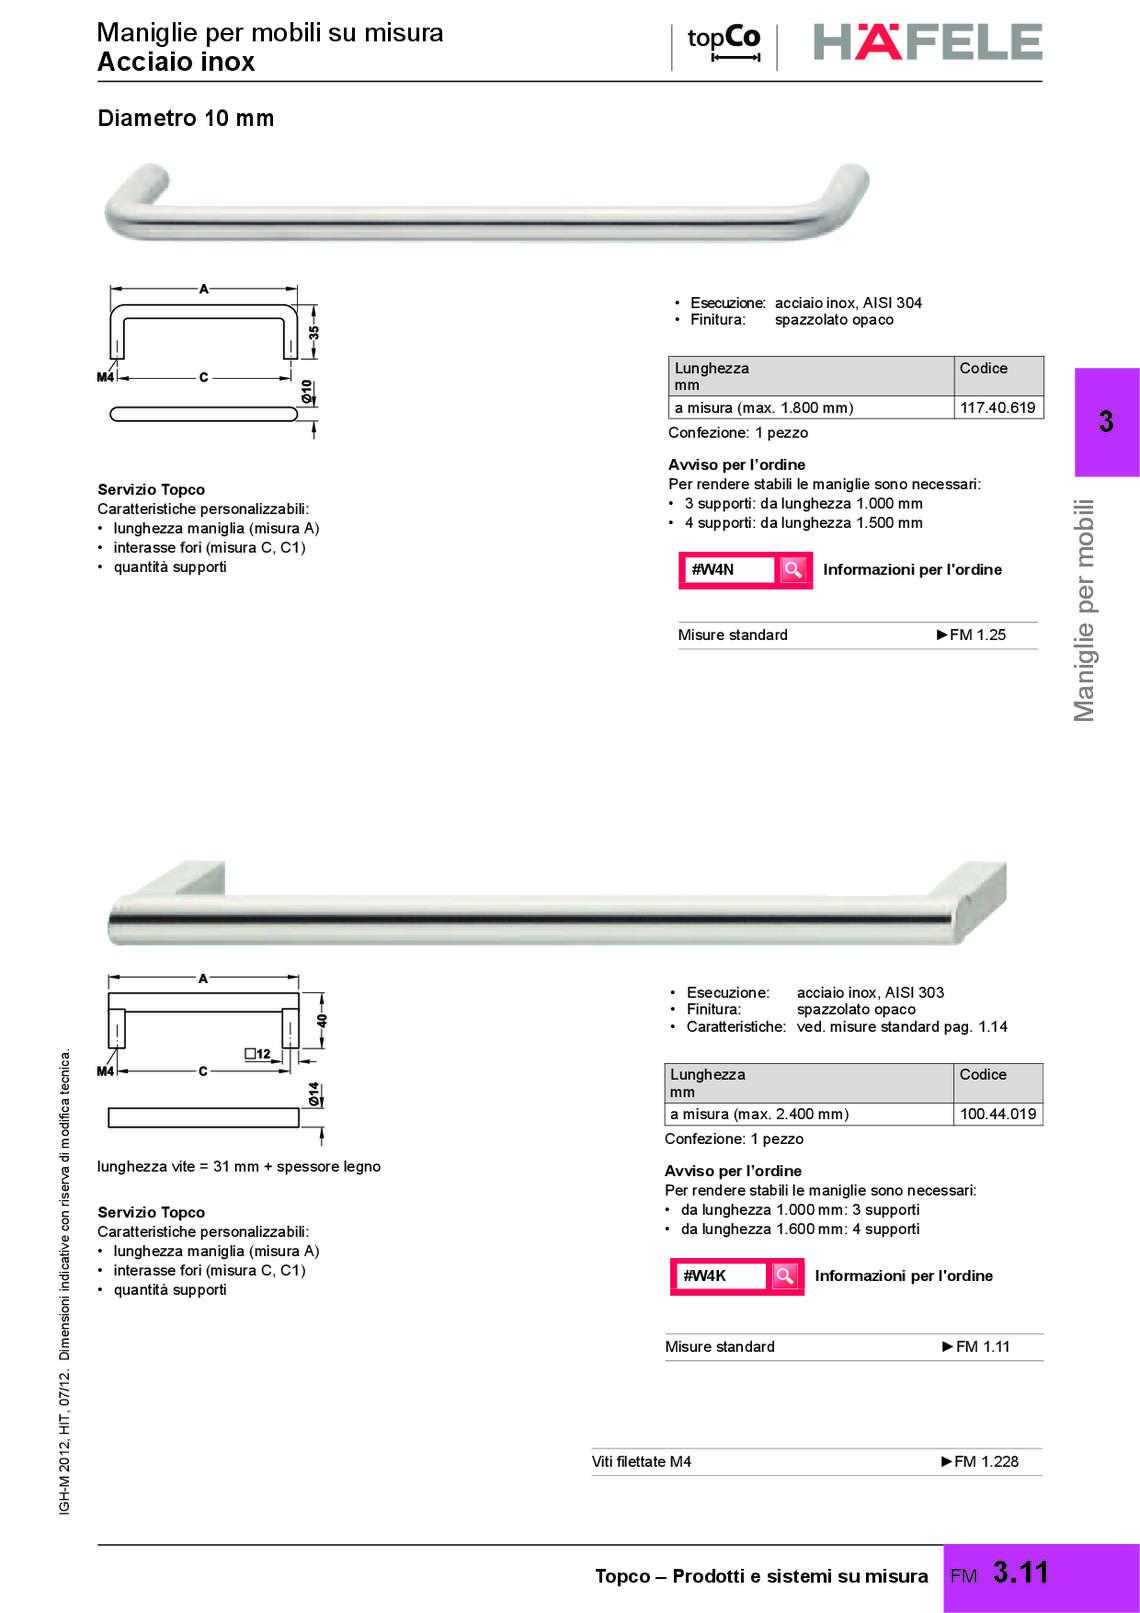 hafele-prodotti-su-misura_81_020.jpg